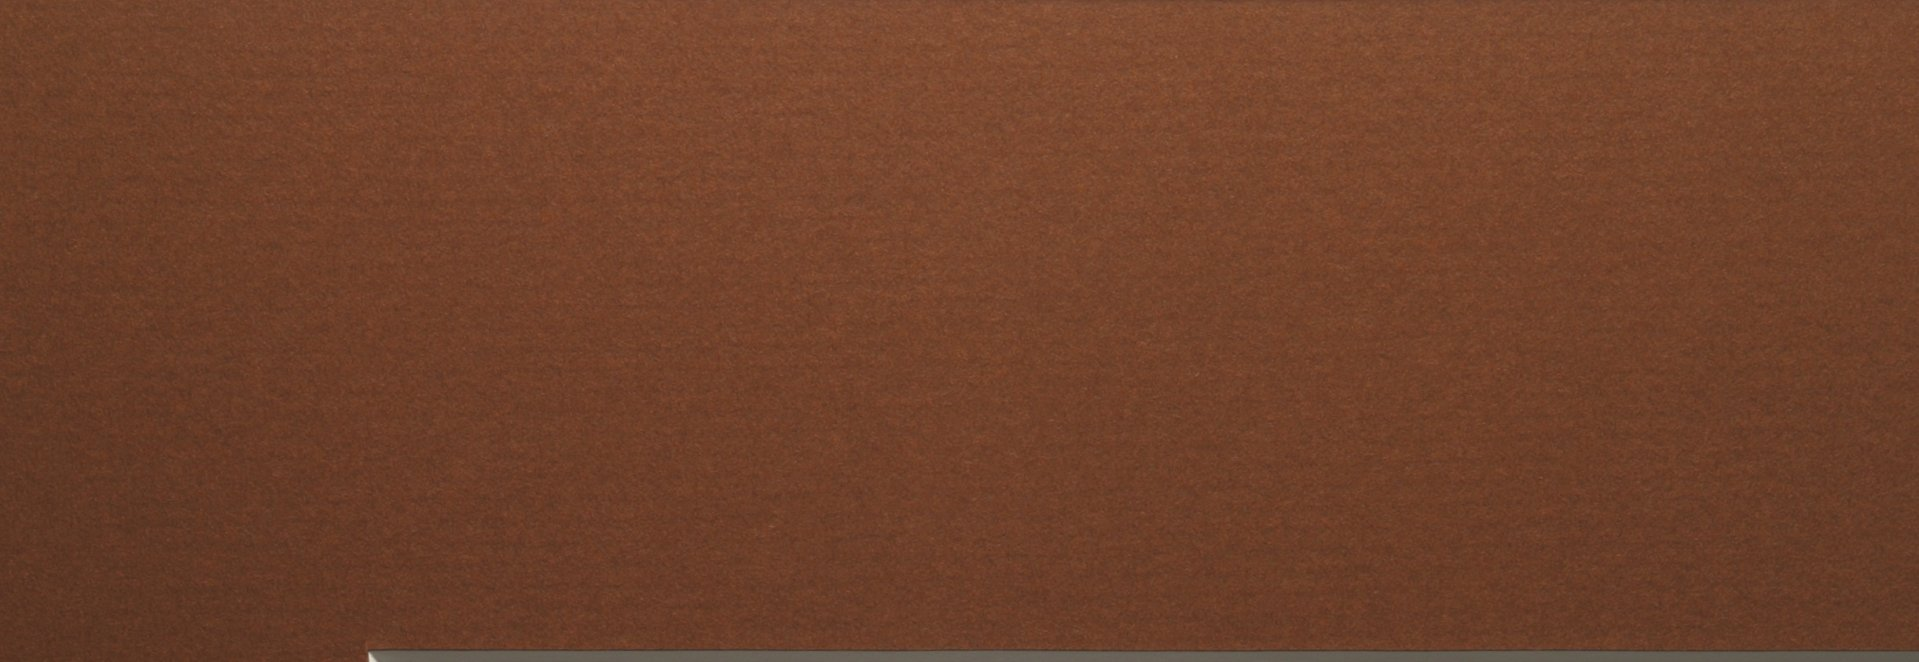 SRM 1040 Classic Brown